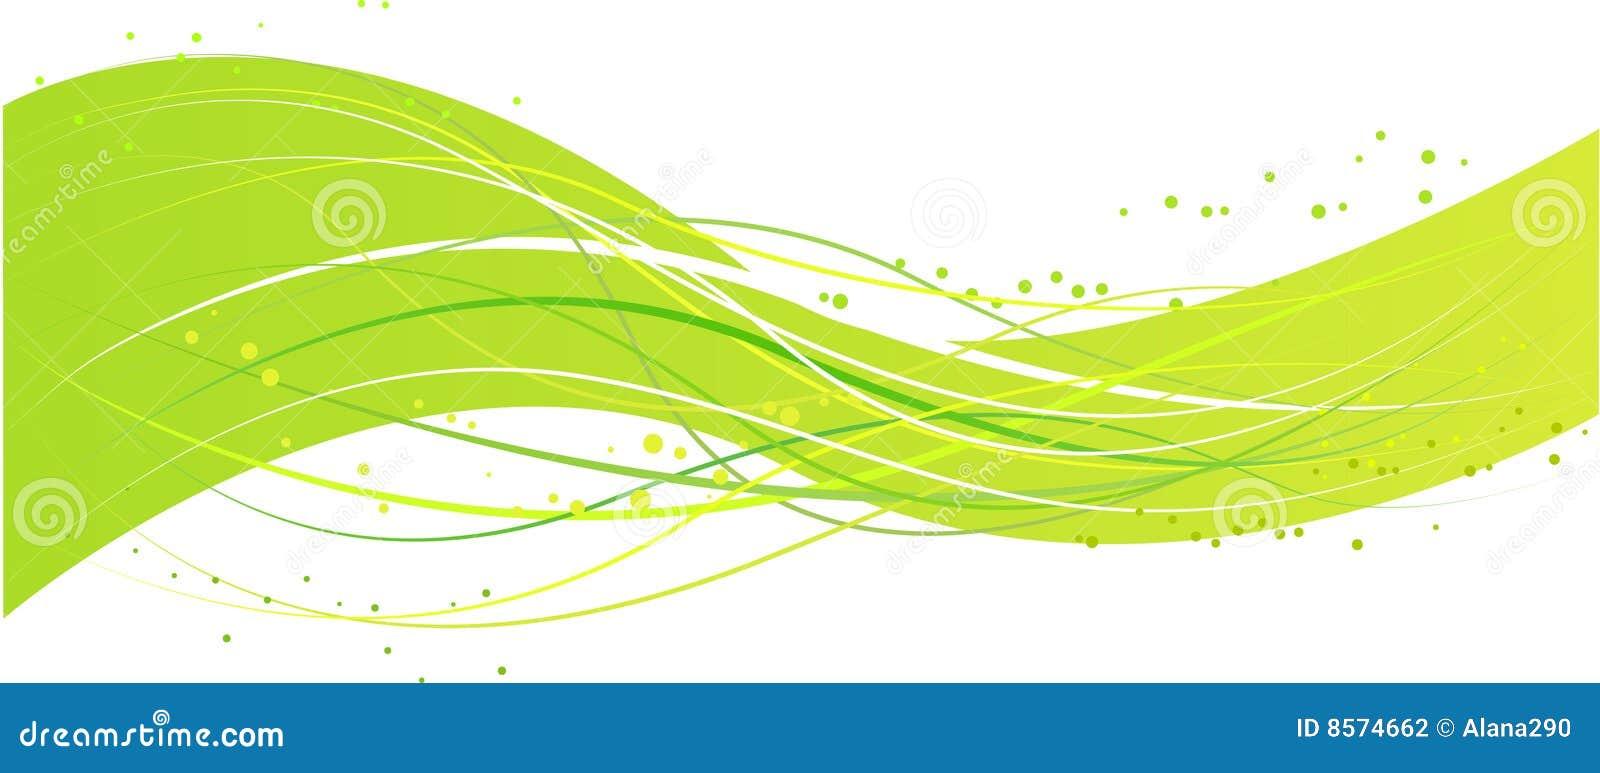 green wave clip art - photo #16